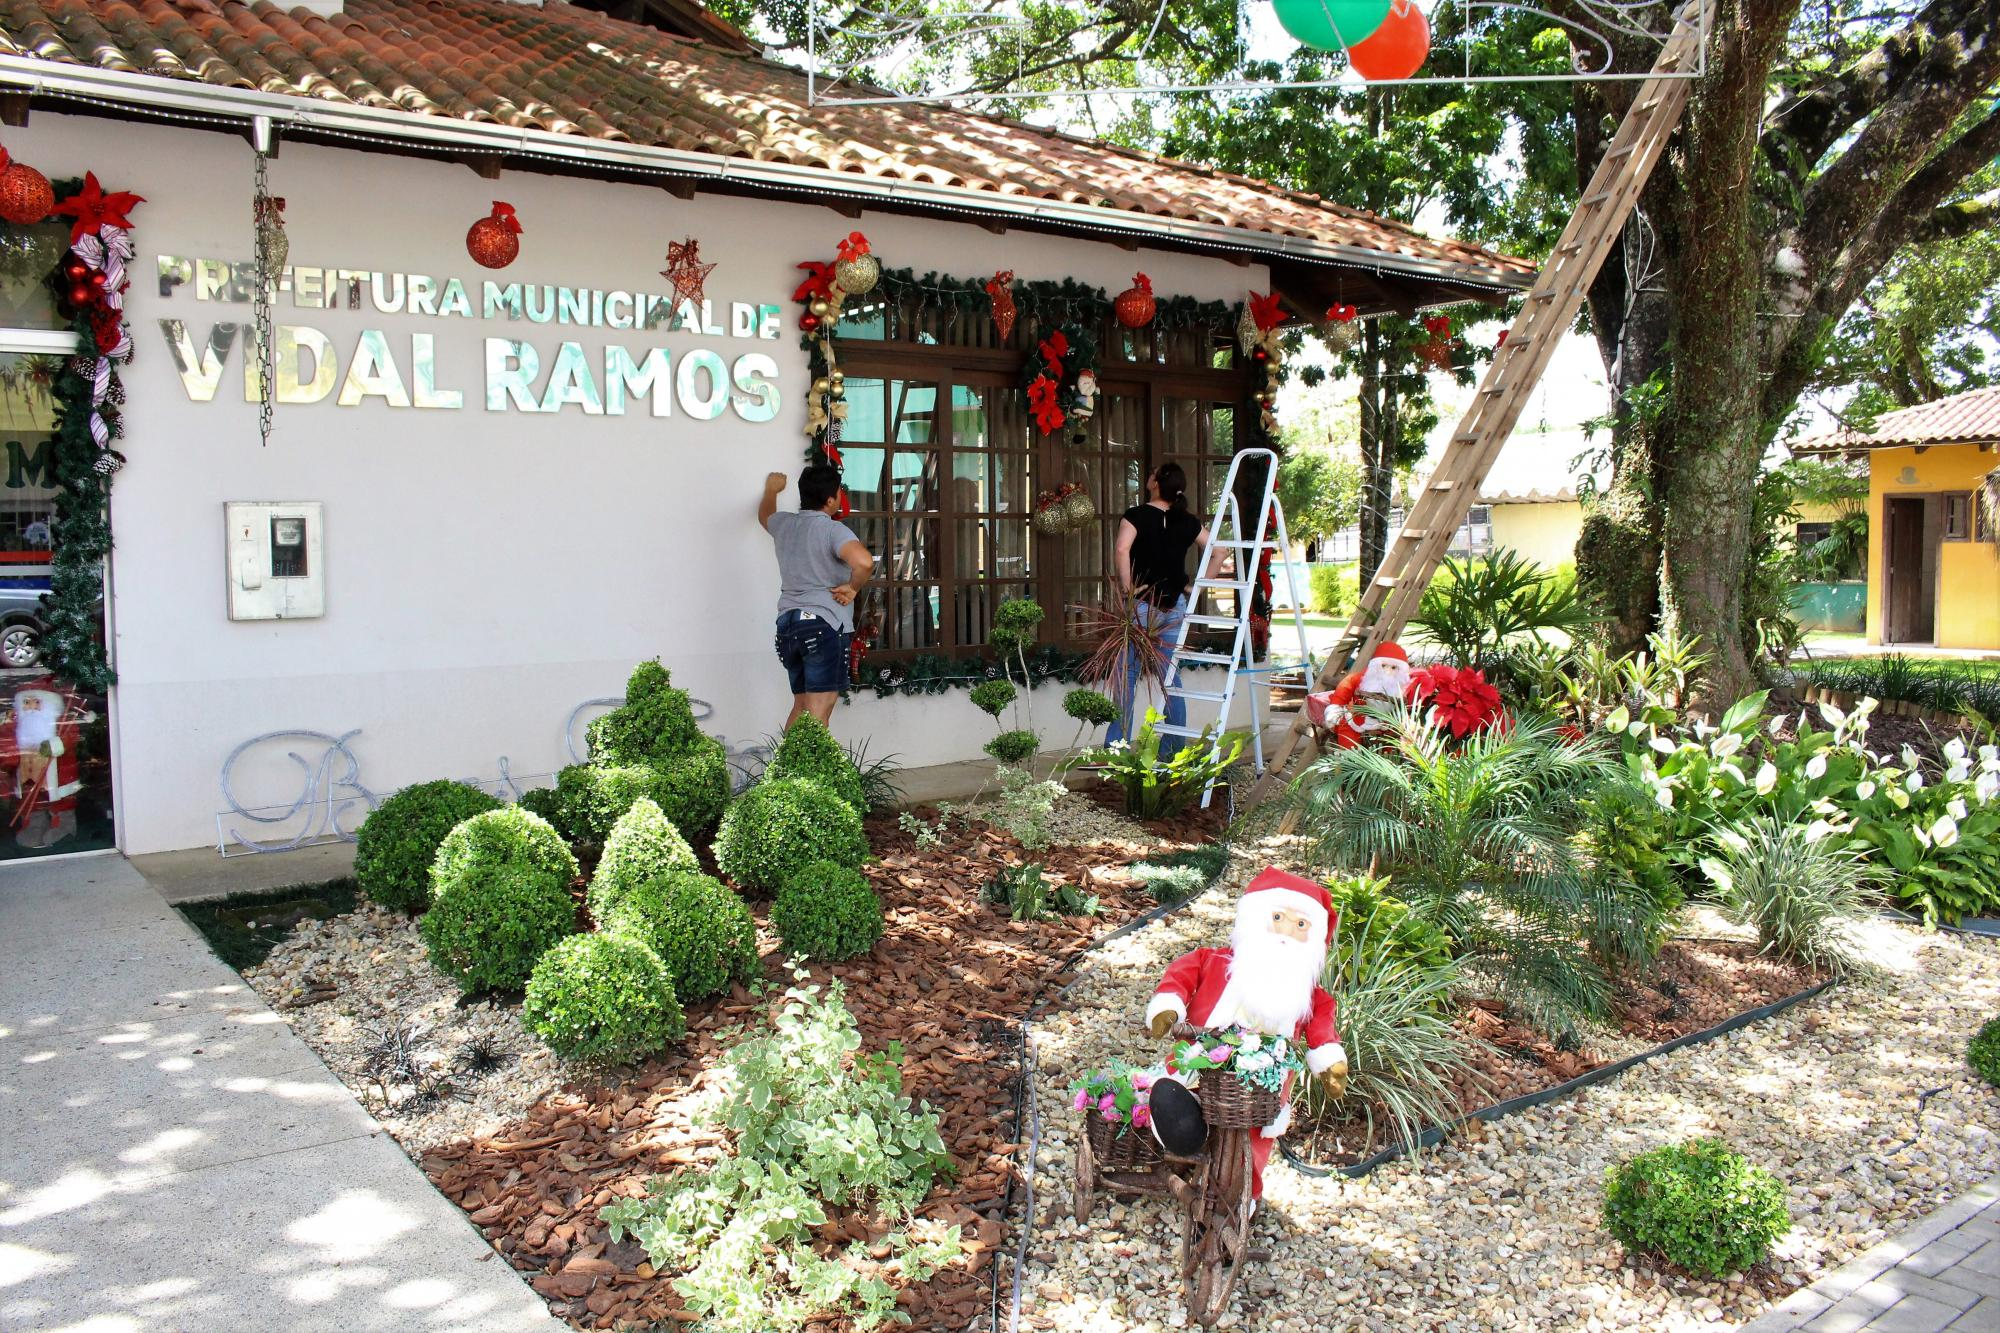 Papai Noel chega em Vidal Ramos neste sábado